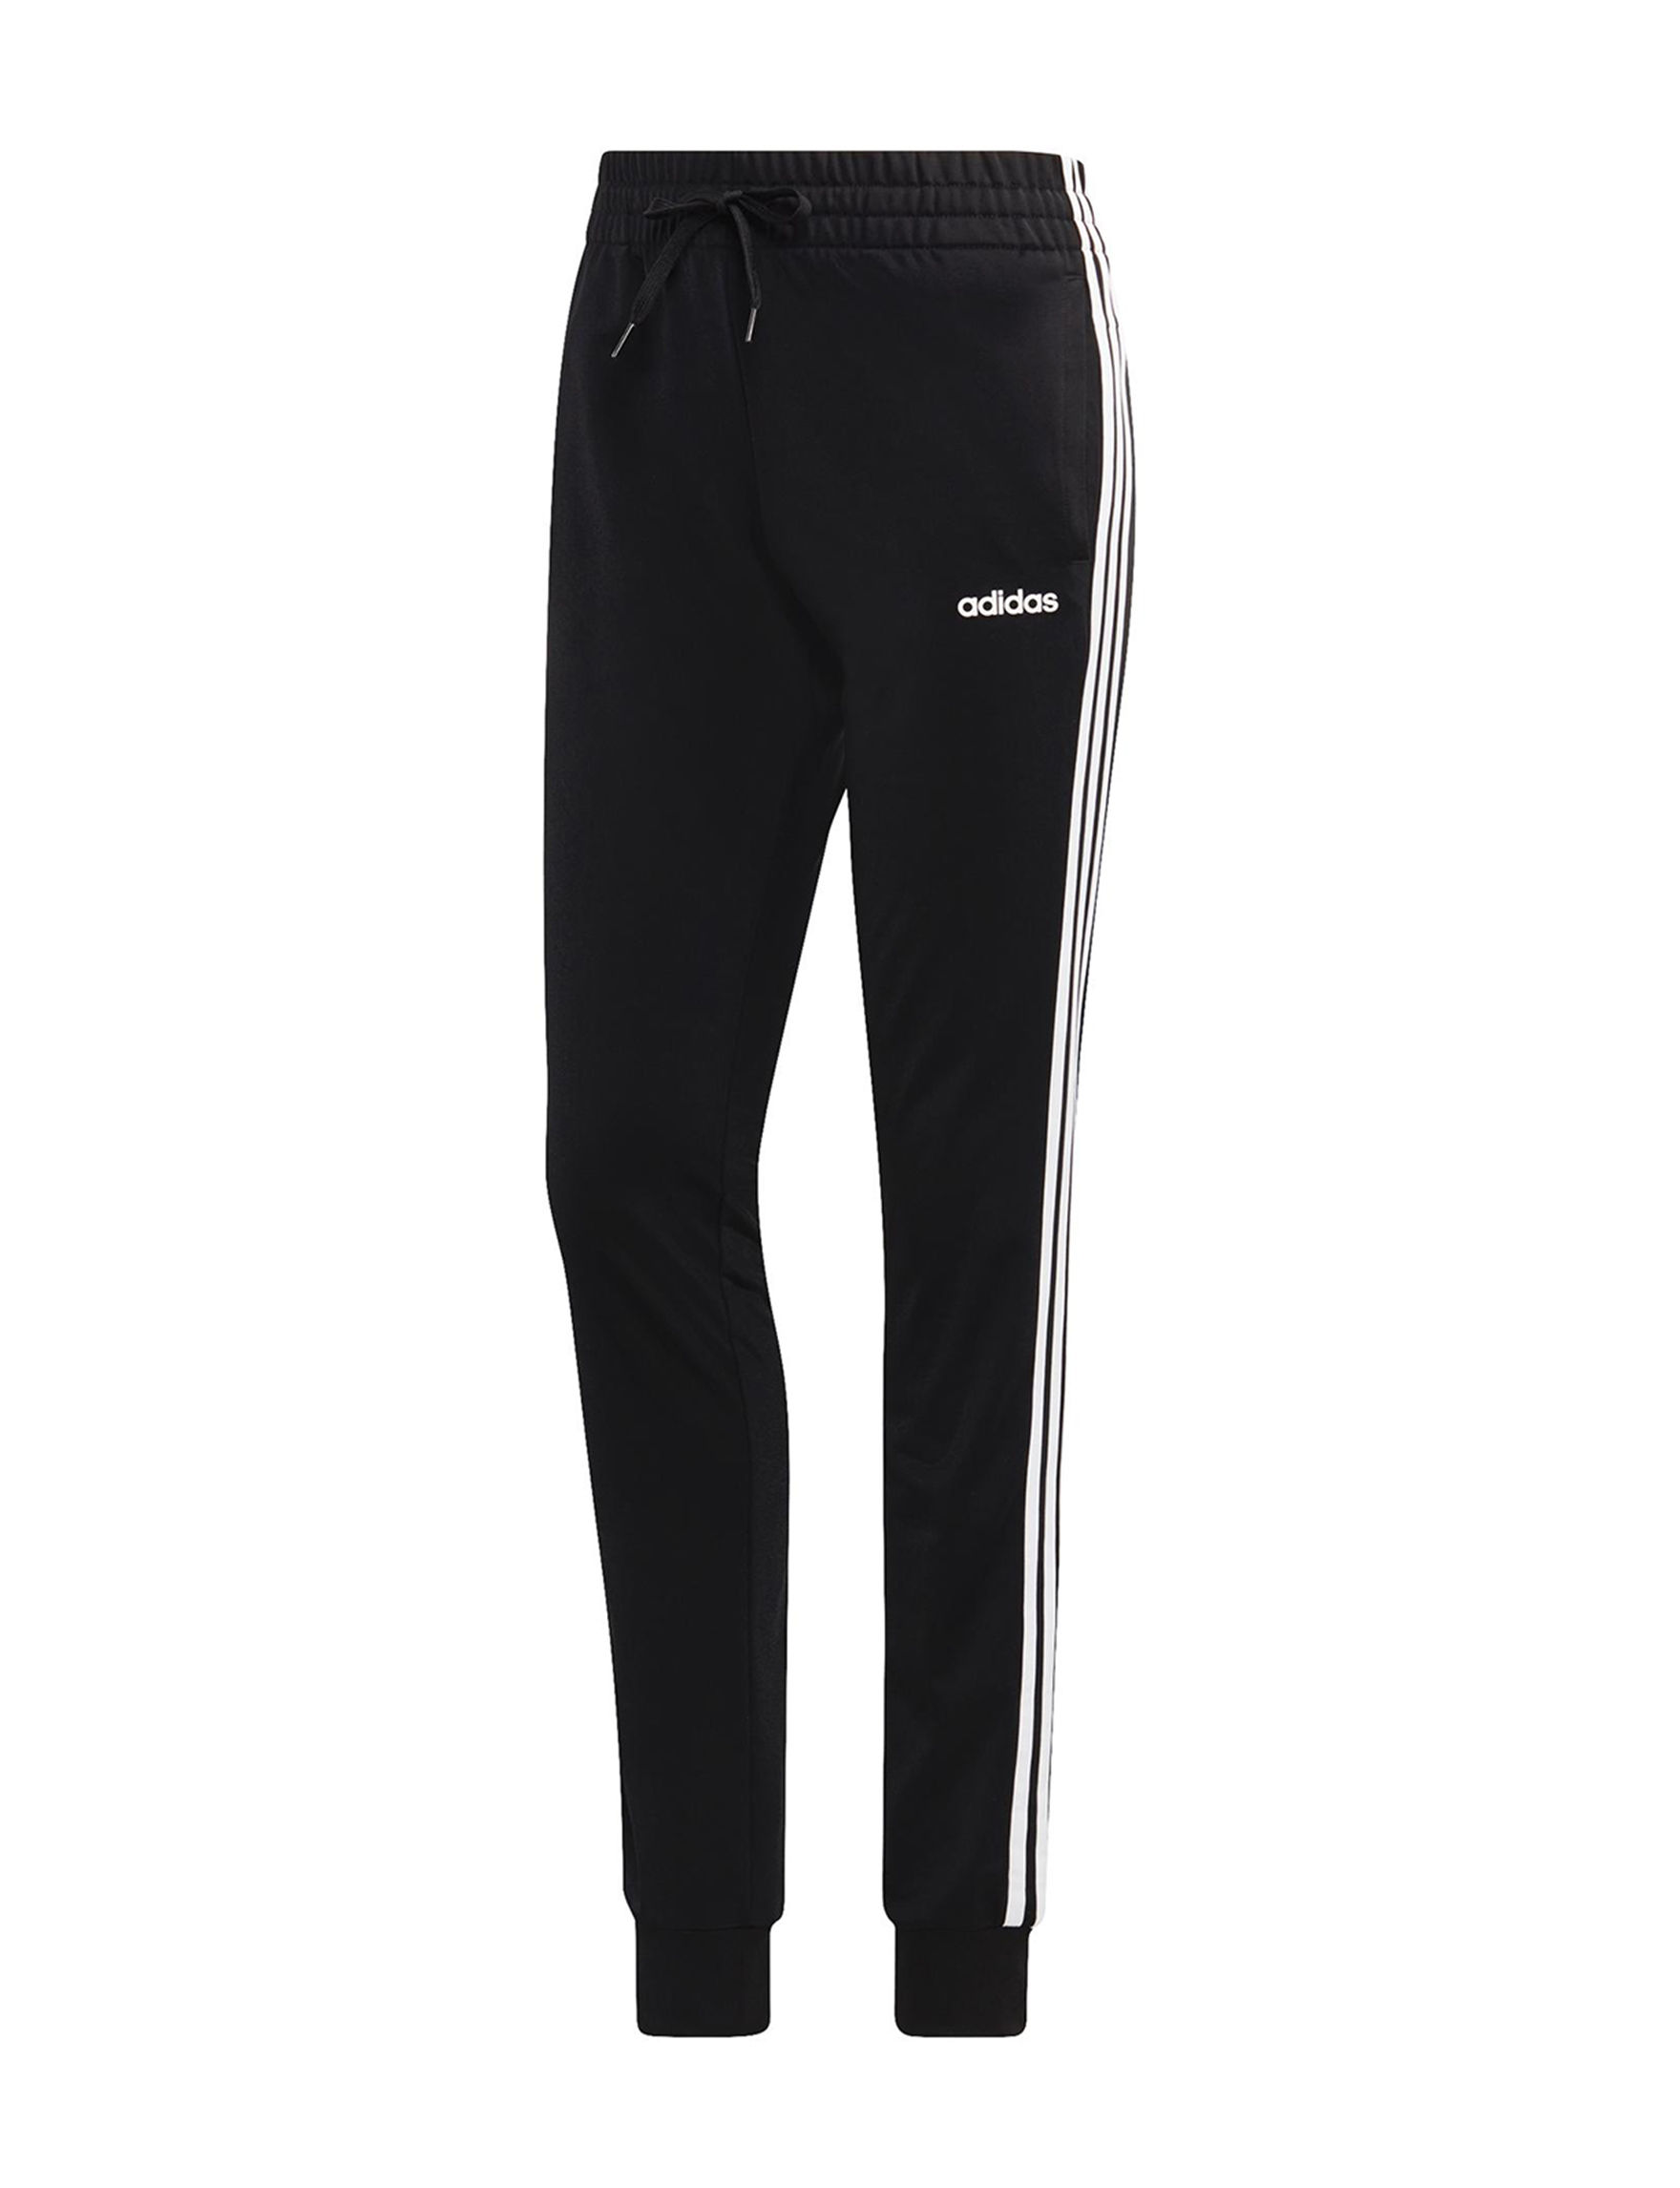 Adidas Black / White Jogger